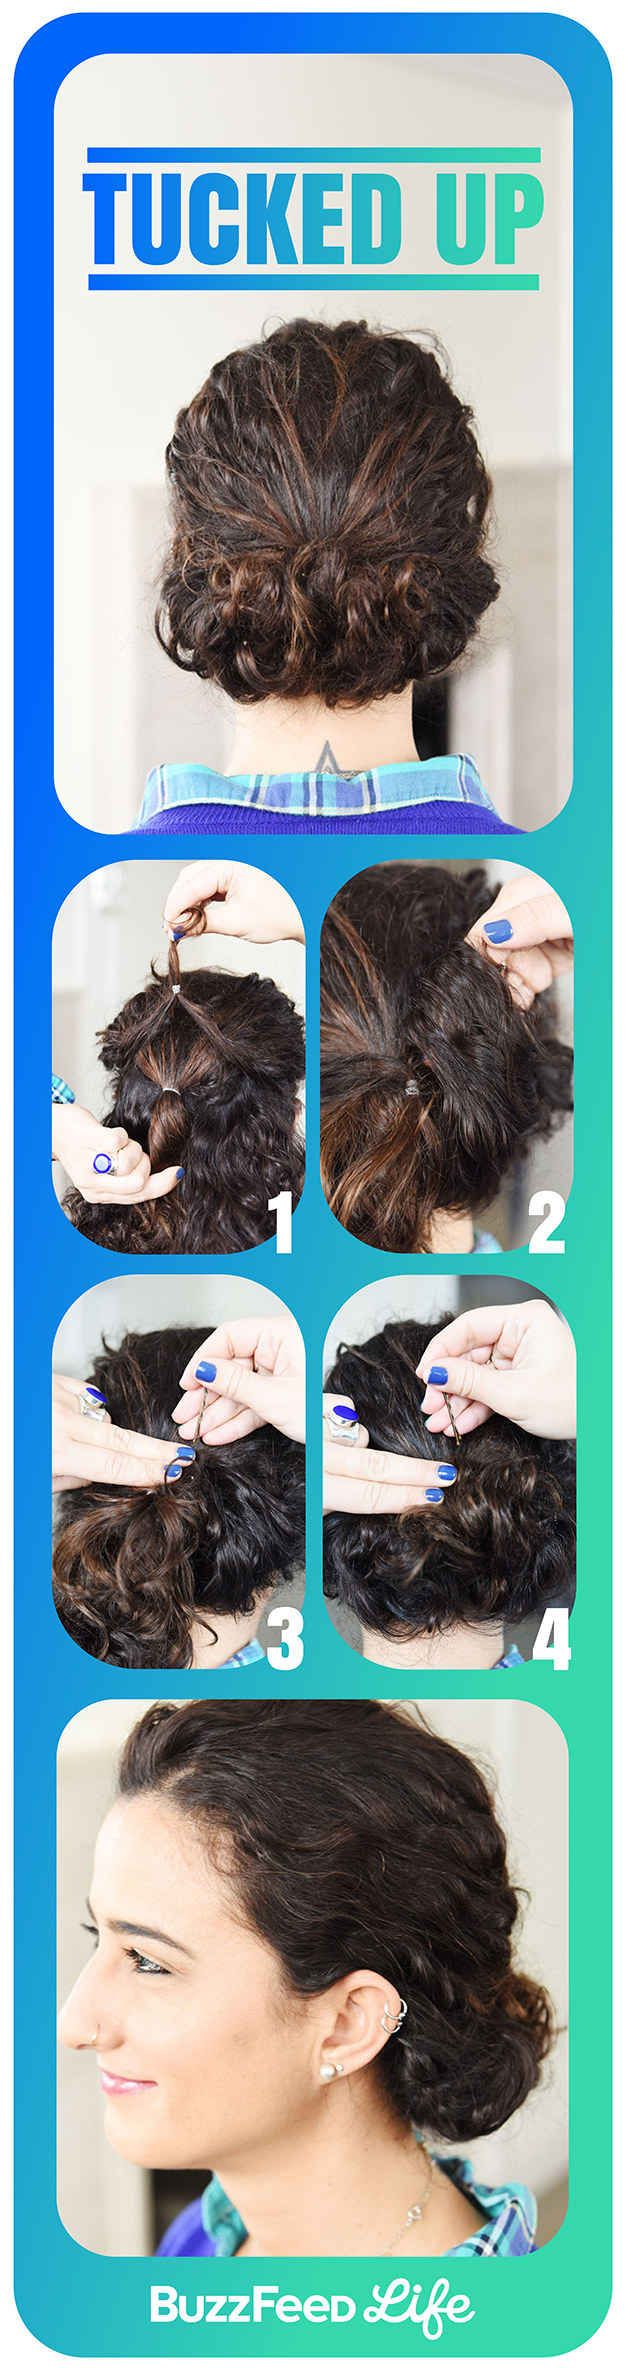 26 increíbles peinados que podrás aprender en 10 pasos o menos